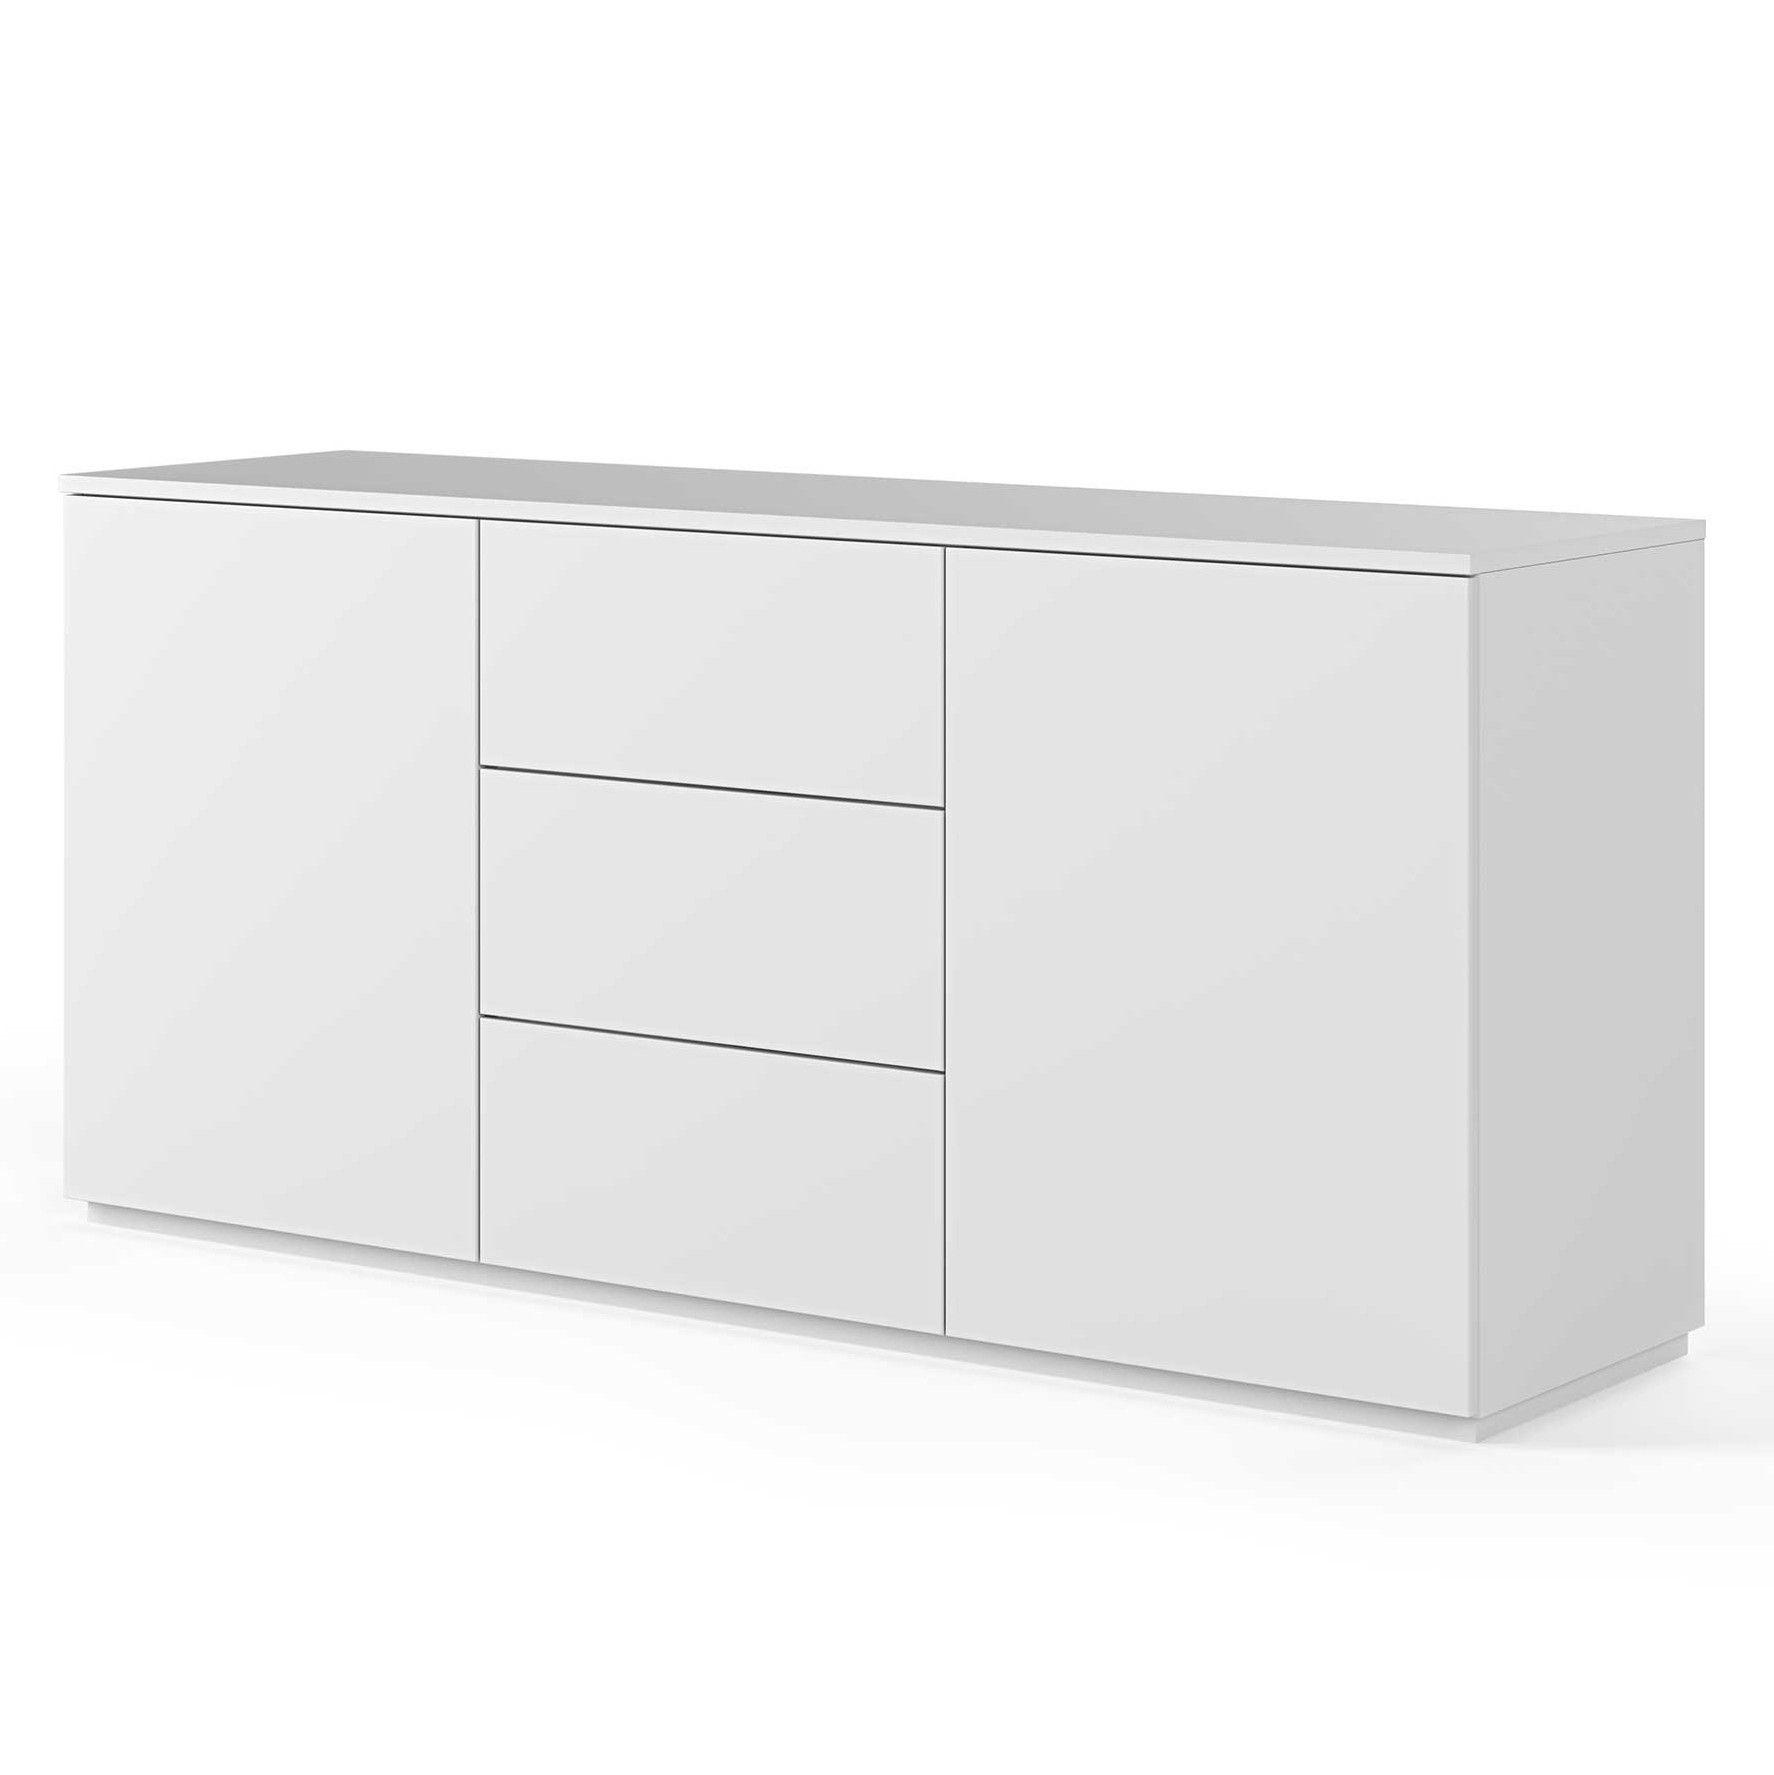 bahut join 180cm a 2 portes et 3 tiroirs blanc mat